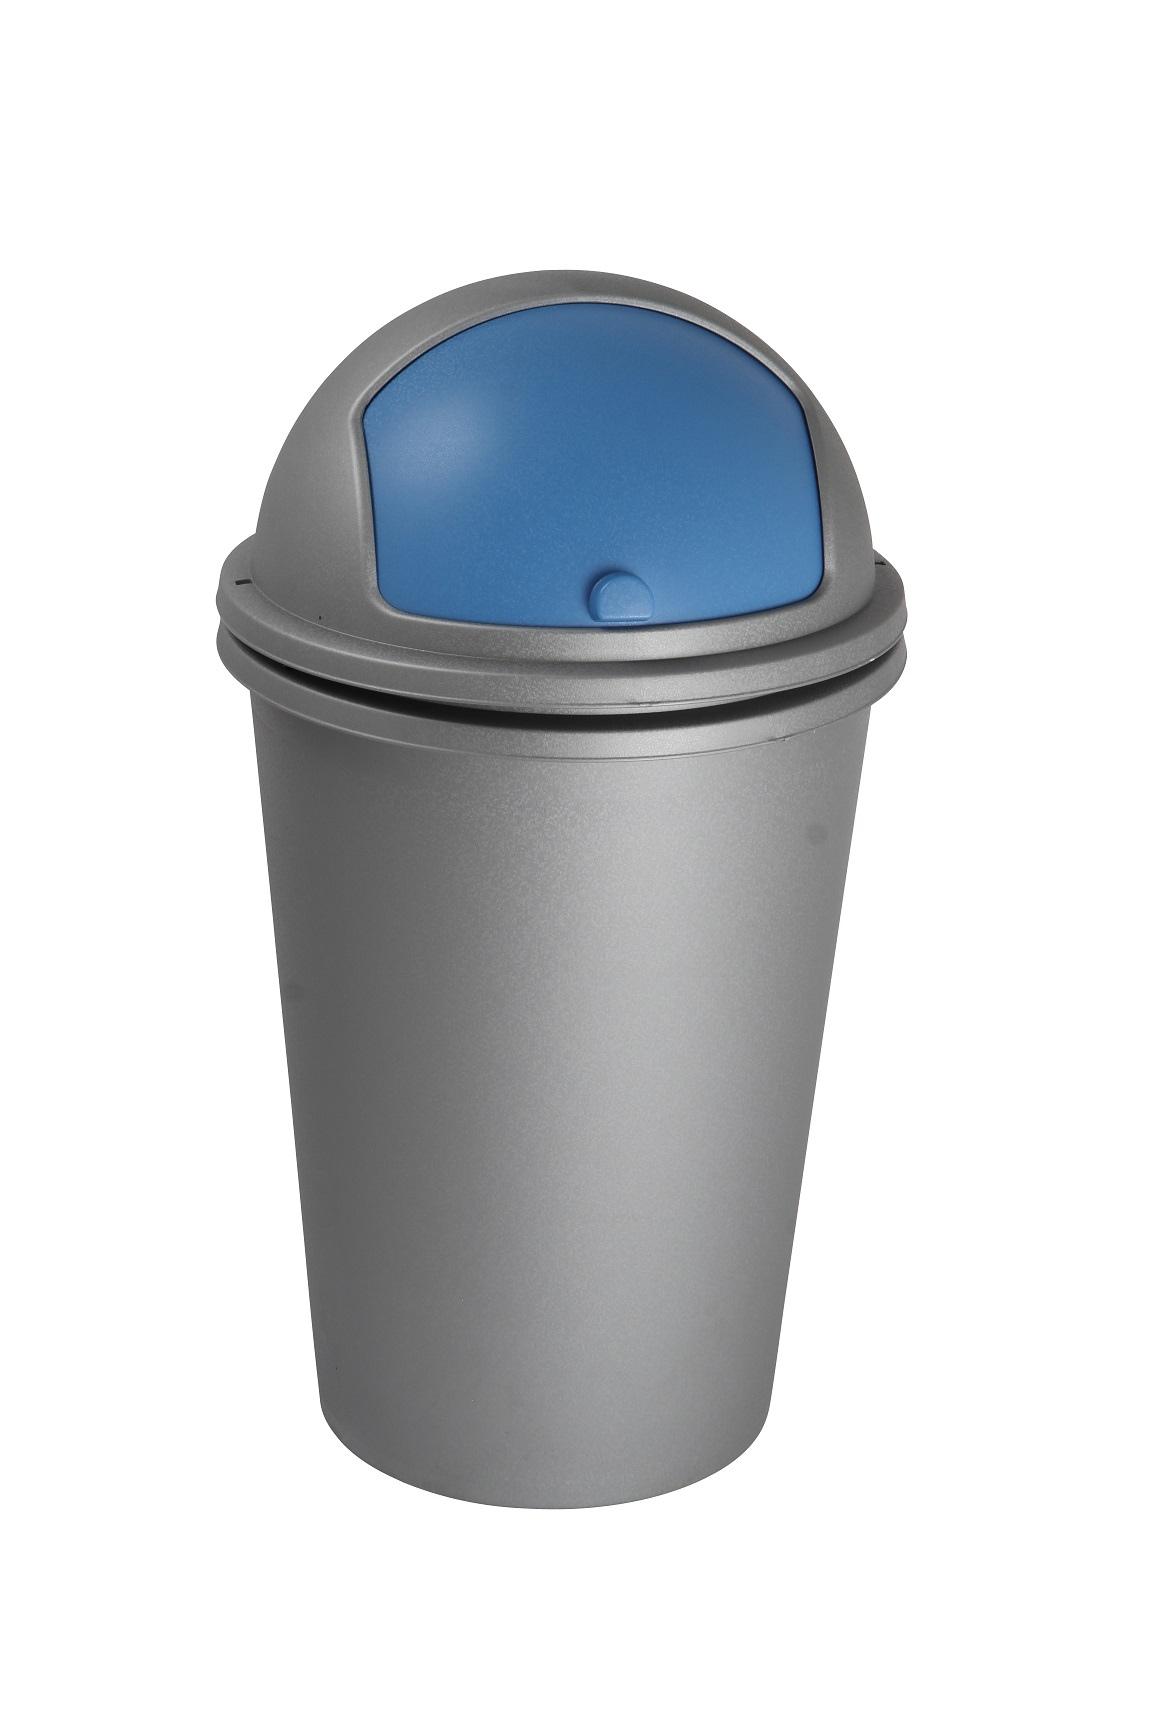 50L, Refuse, Bucket, Paper, Bins, Rubbish, Dust